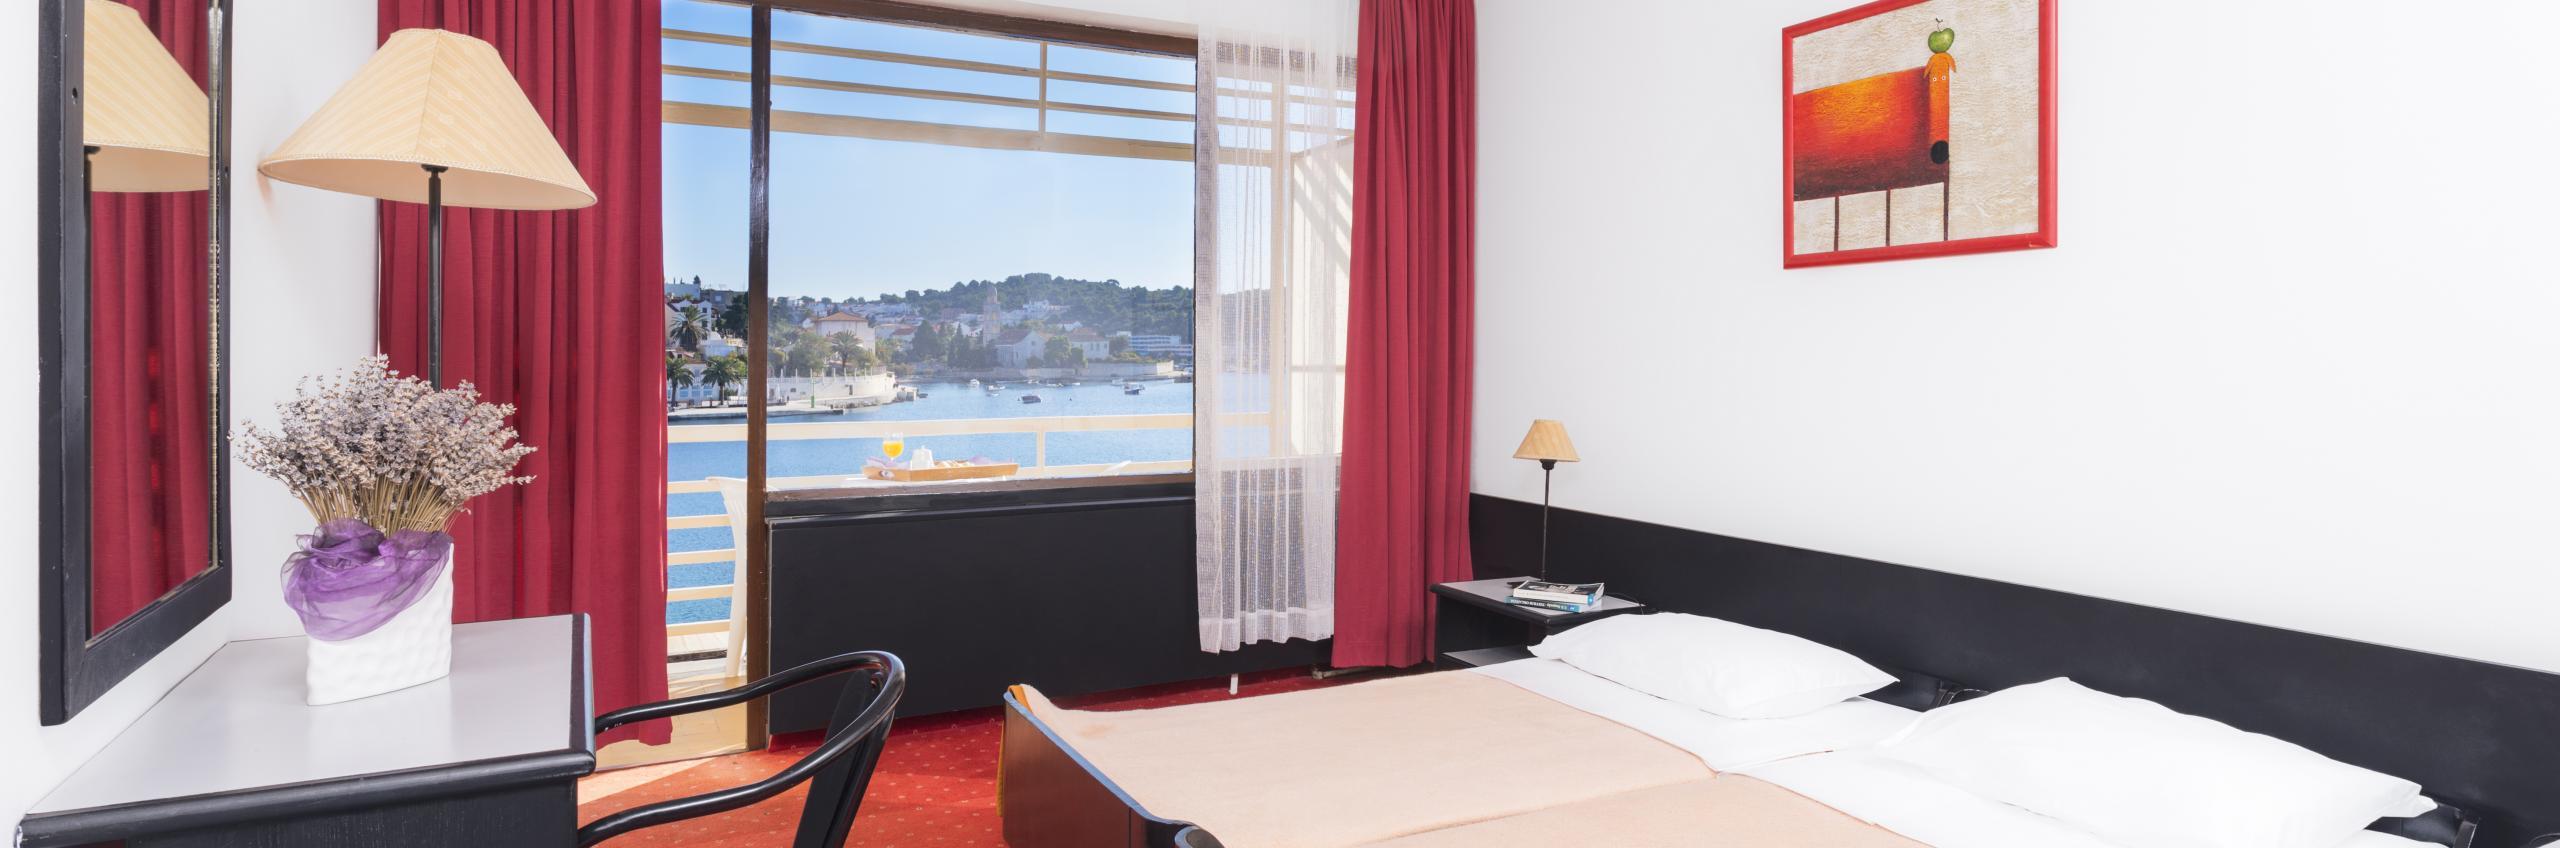 Delfin hotel guest room